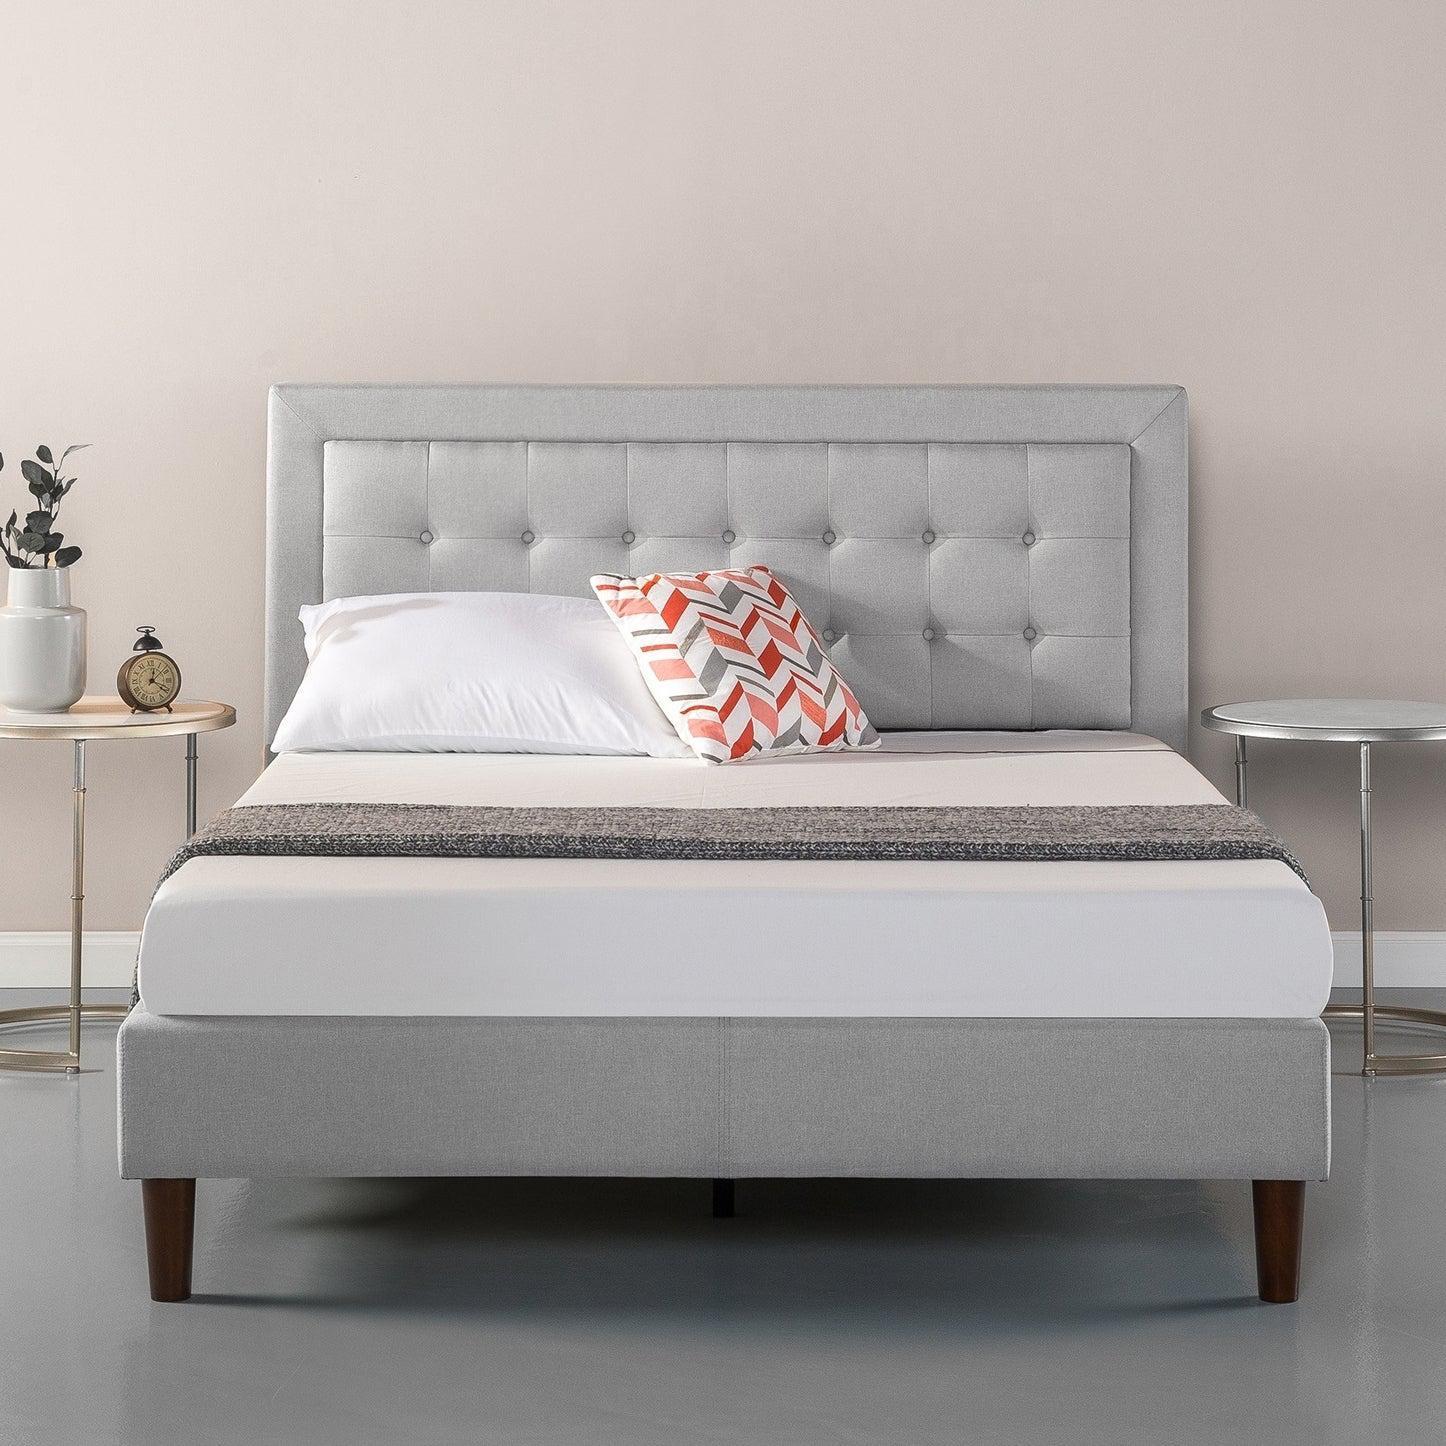 Zinus Dachelle Tufted Premium Platform Fabric Bed Frame Single Double Queen King Size Matt Blatt